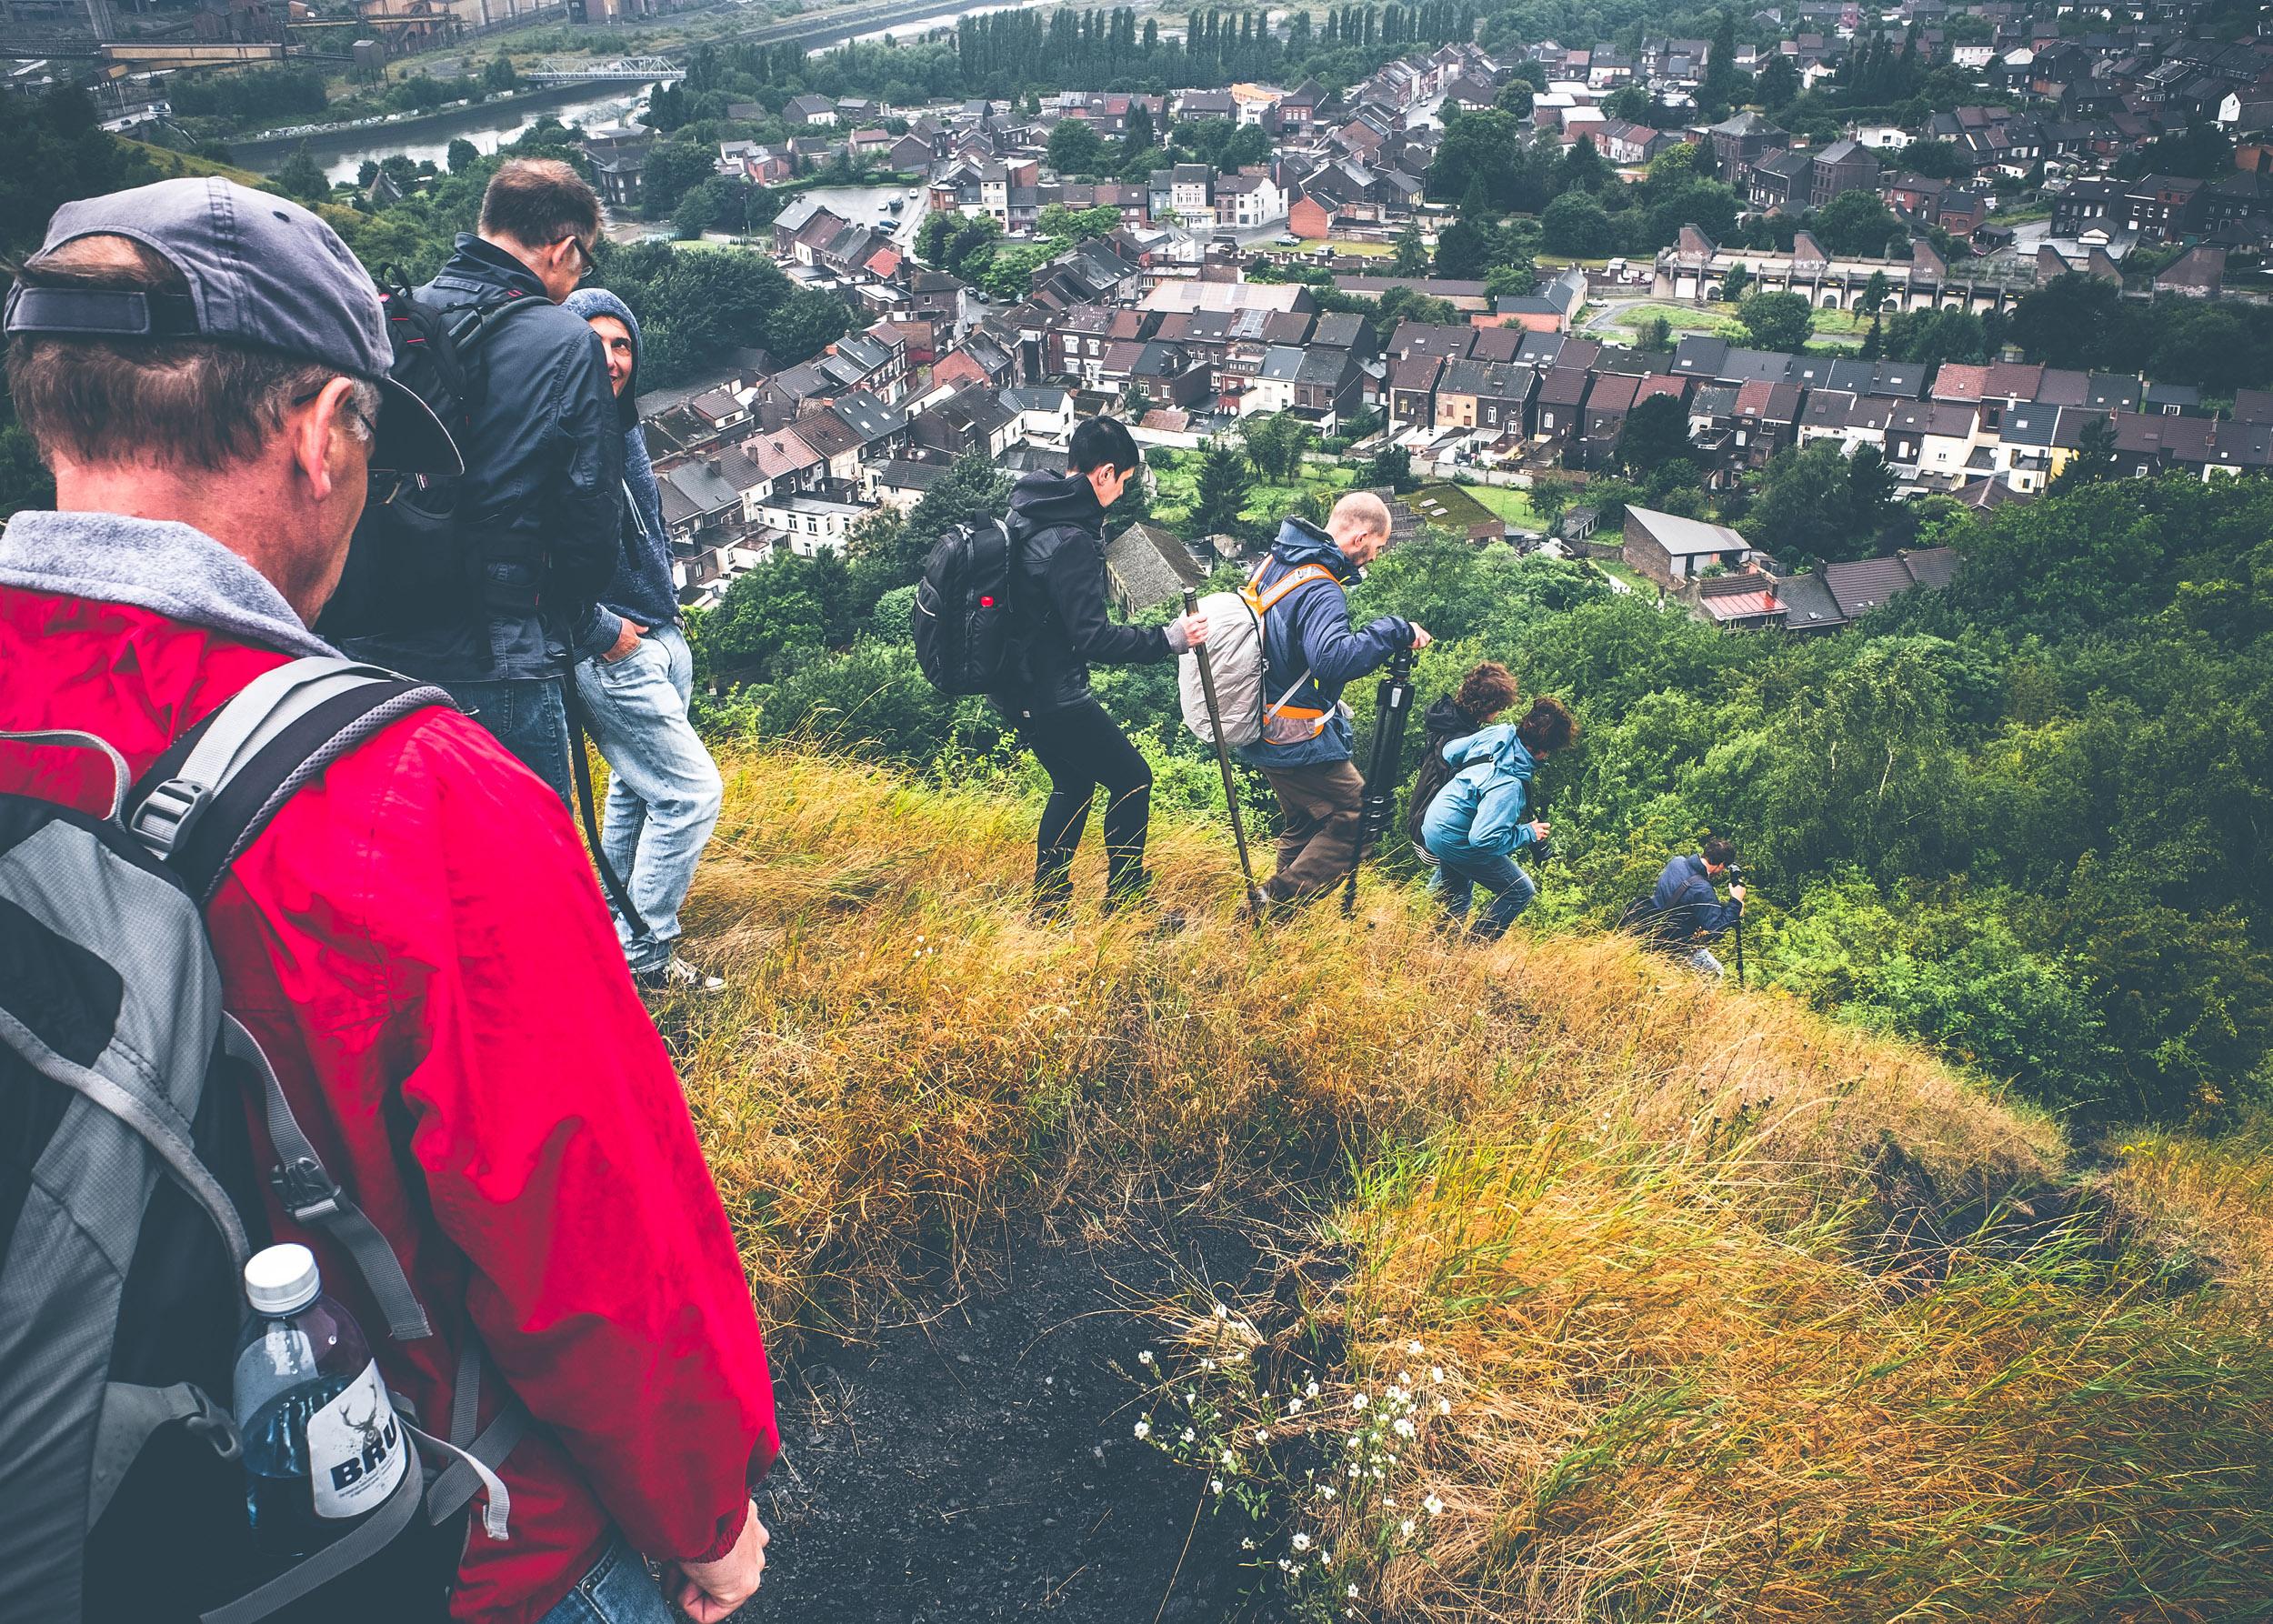 glenn vanderbeke, Landschap, cityscape, charleroi, stadsfotografie, stadssafari, charleroi adventure, landschapsfotografie, landschapsfotograaf, charleroi adventure, fotograferen in charleroi, fotografie charleroi, fotolocaties charleroi, fotografie locaties charleroi